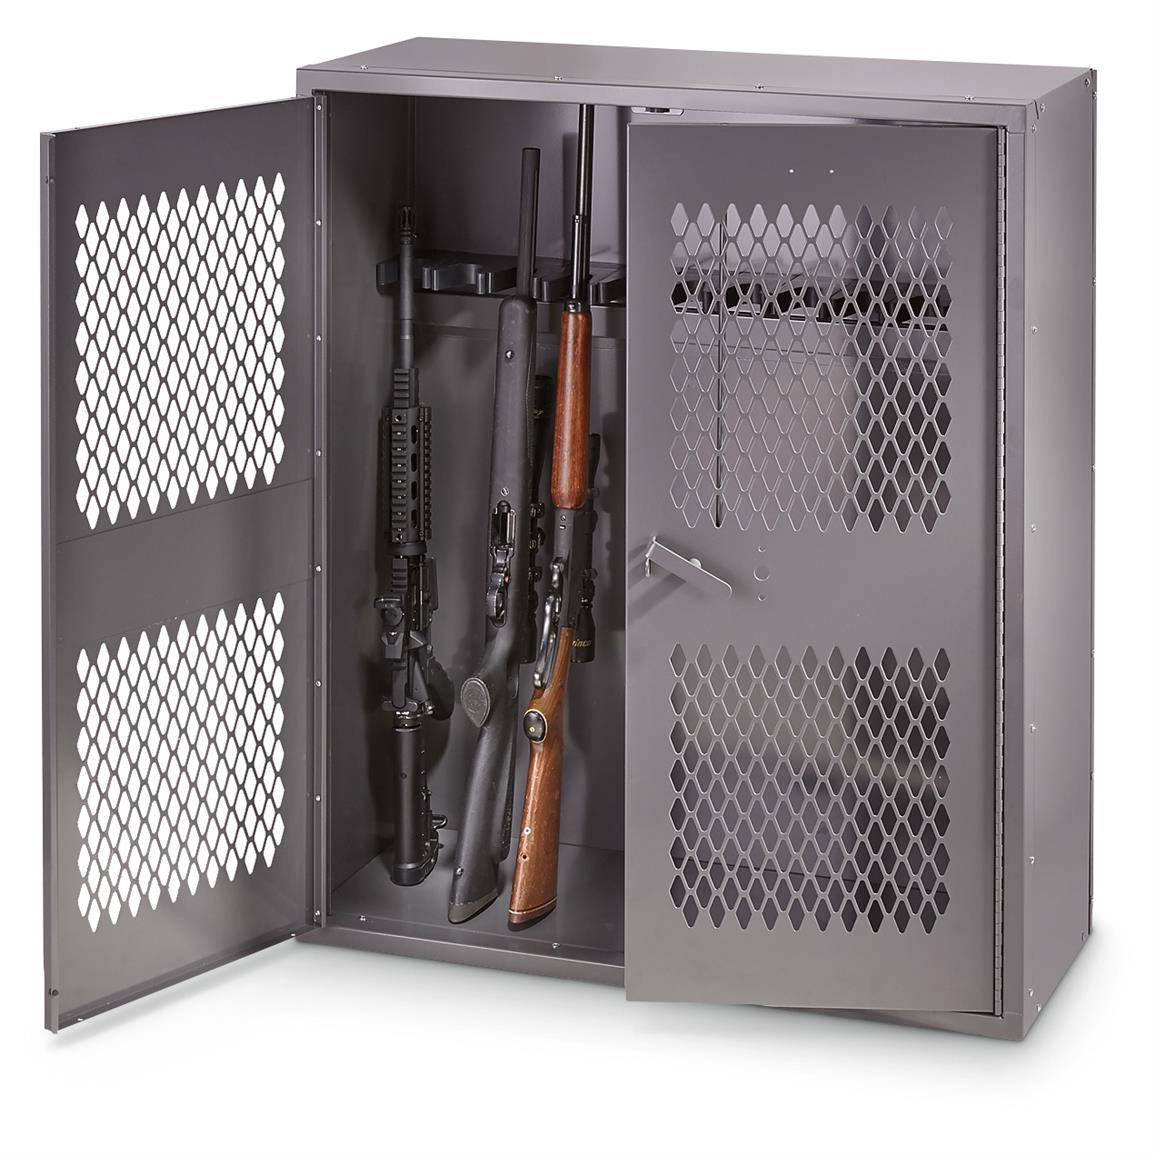 Hq Issue Metal Gun Locker 36 Quot W X 42 Quot H 179 99 Gun Deals